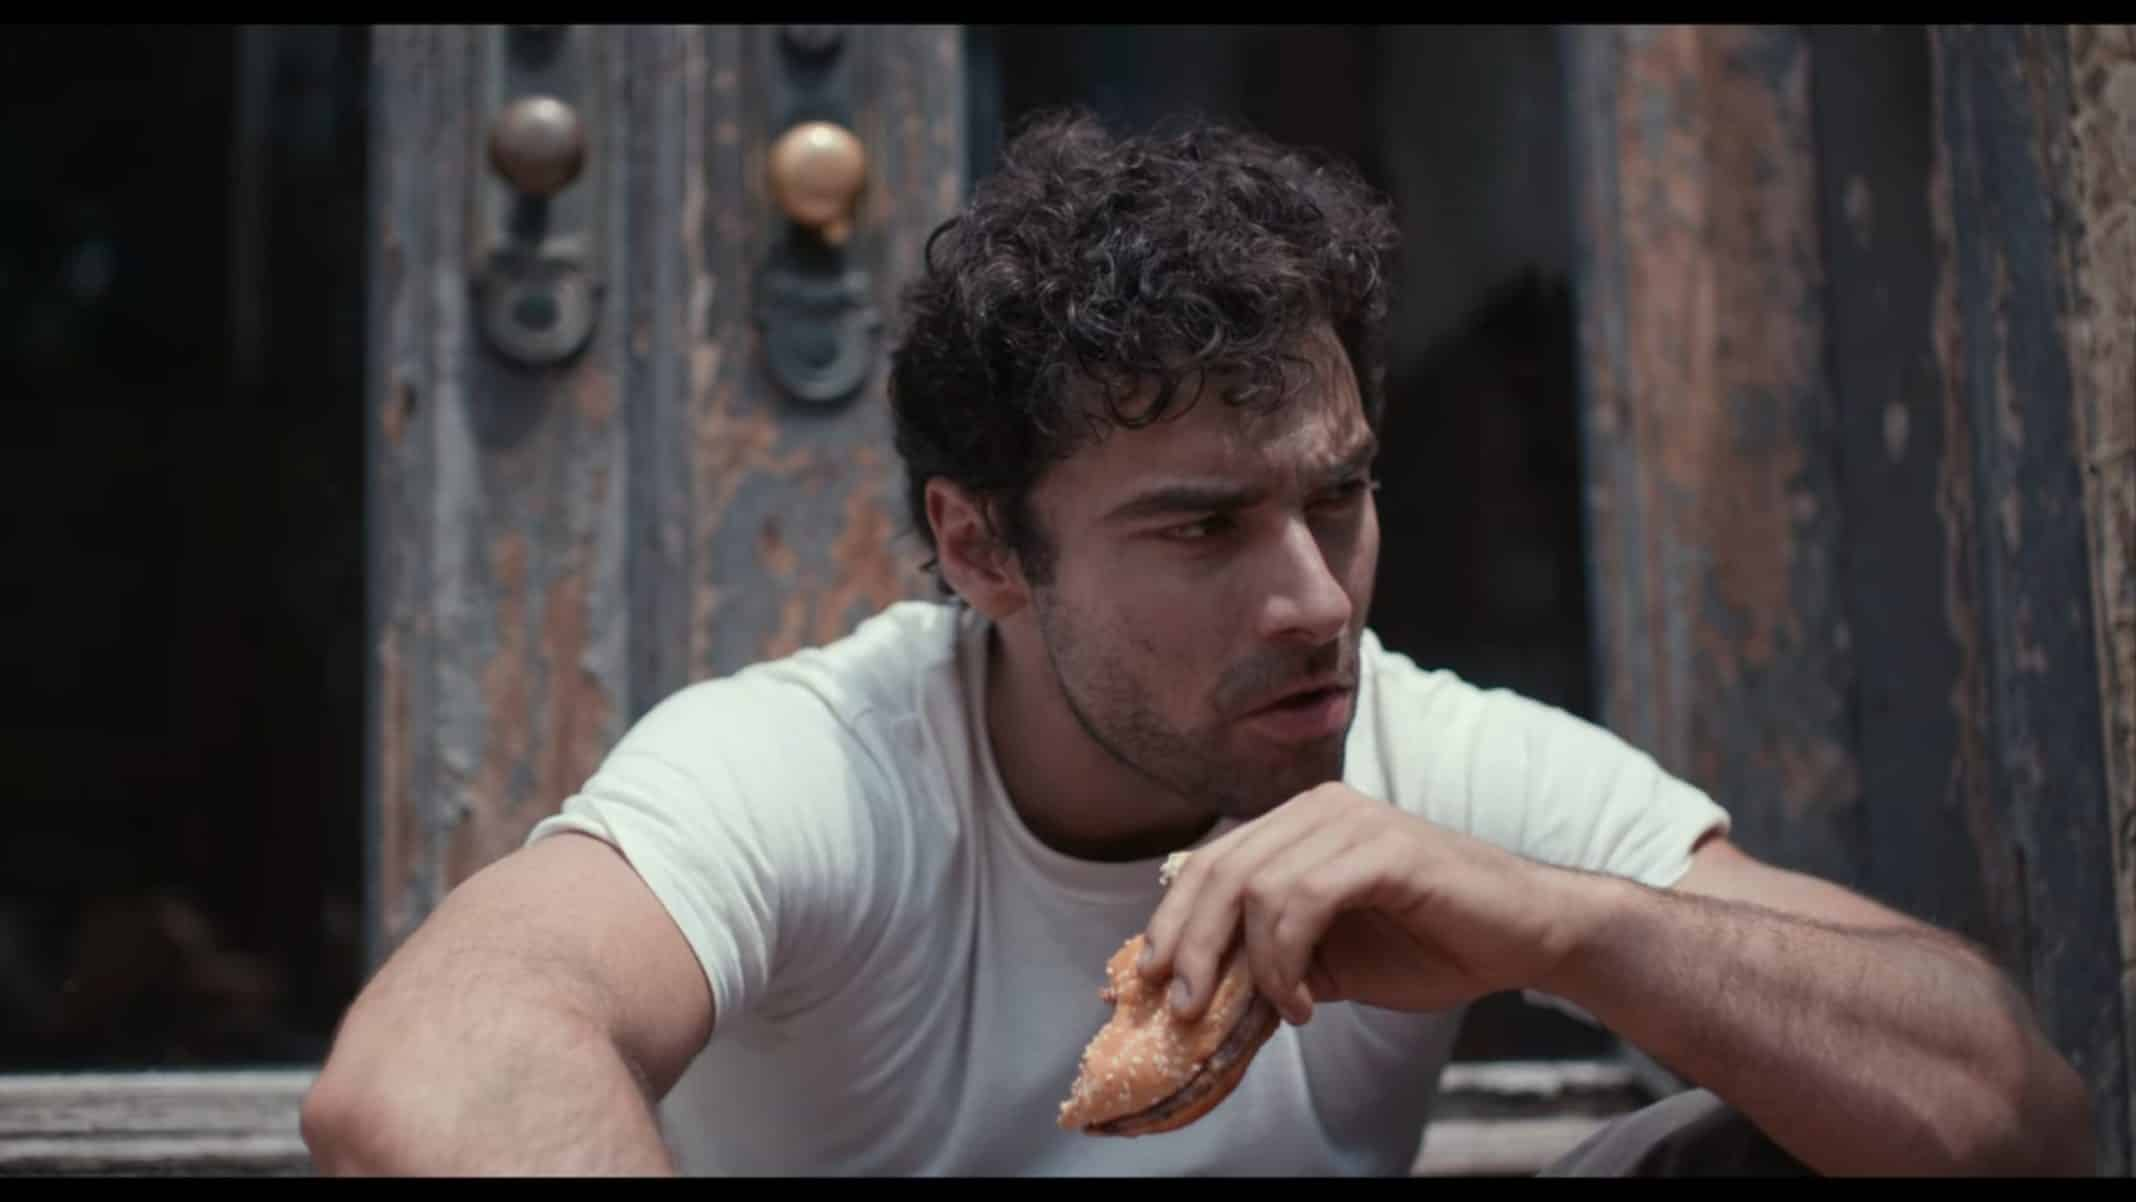 Russell (Aidan Turner) eating a burger.